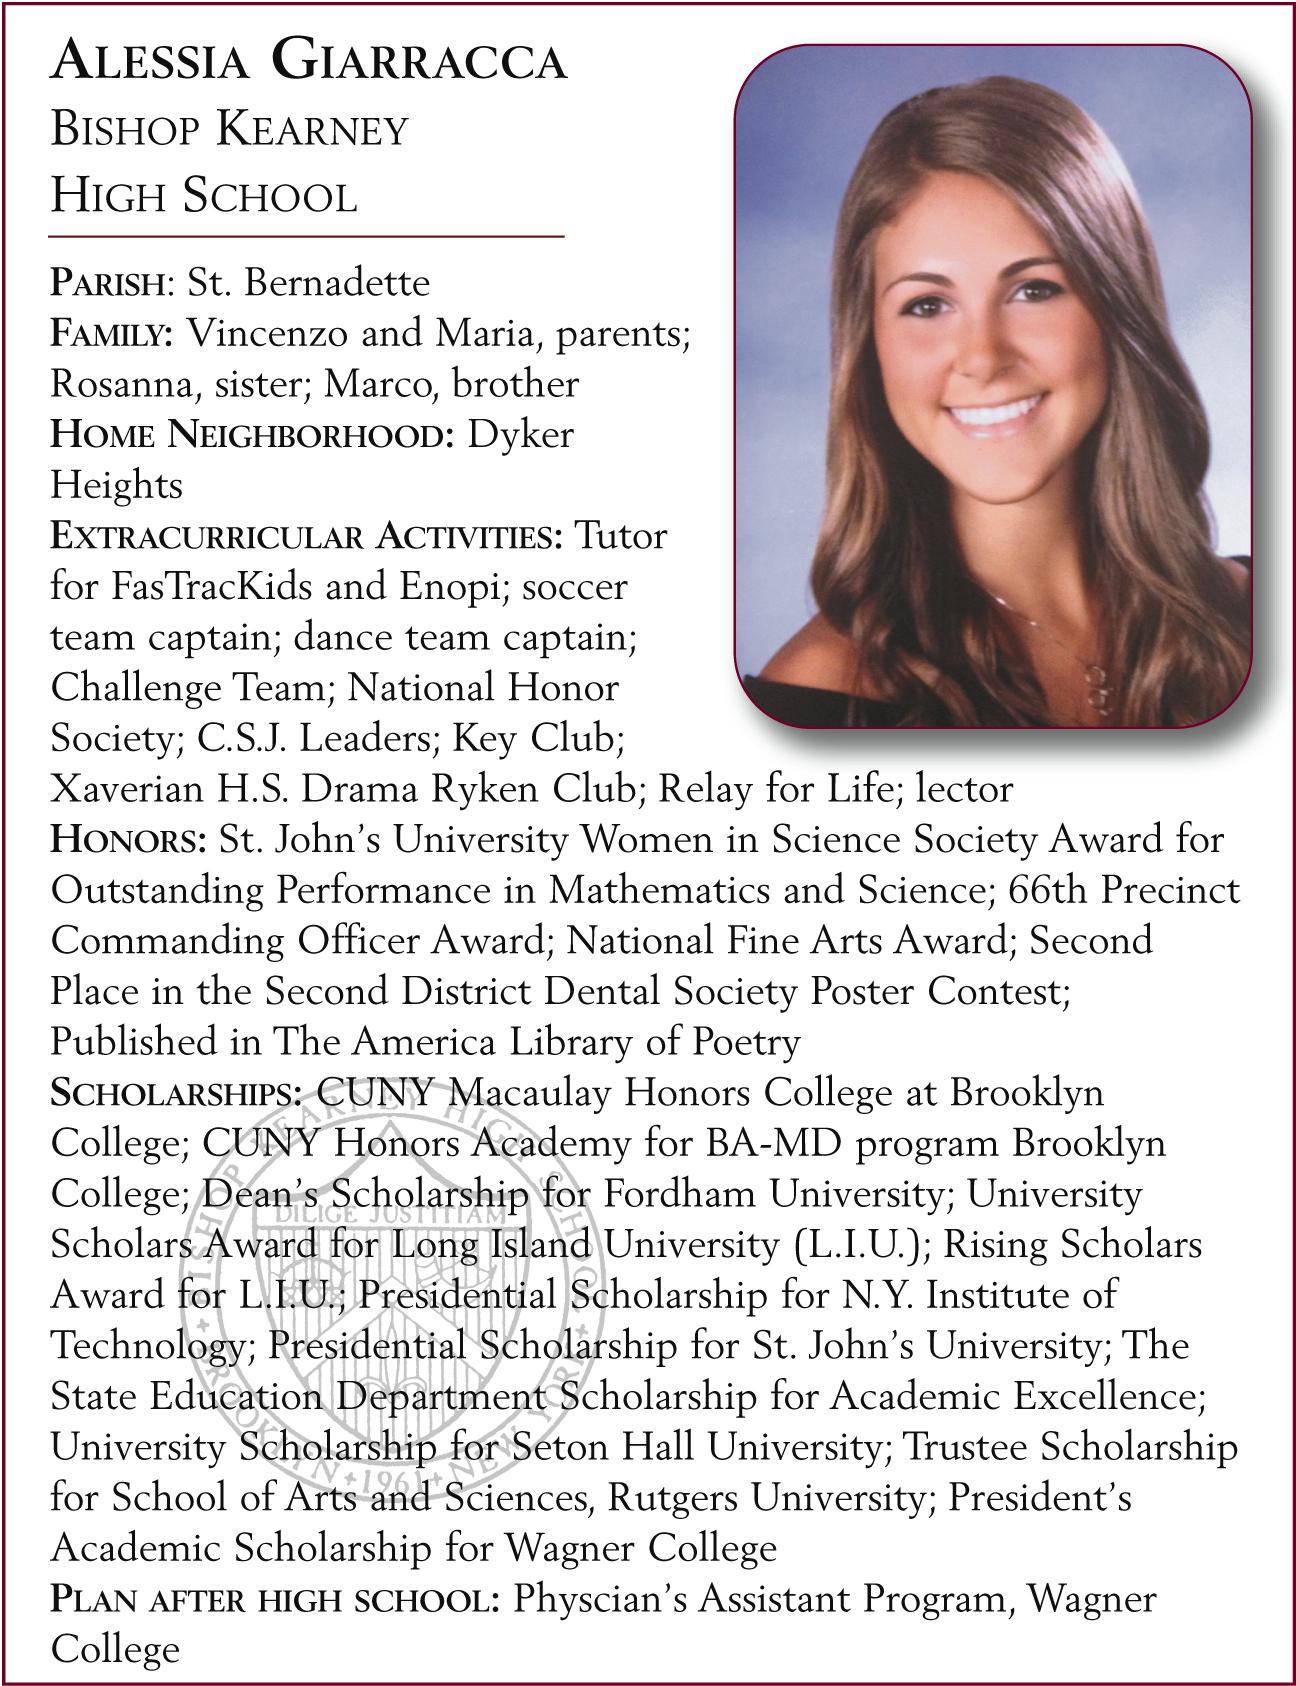 Alessia Giarracca, Bishop Kearney High School